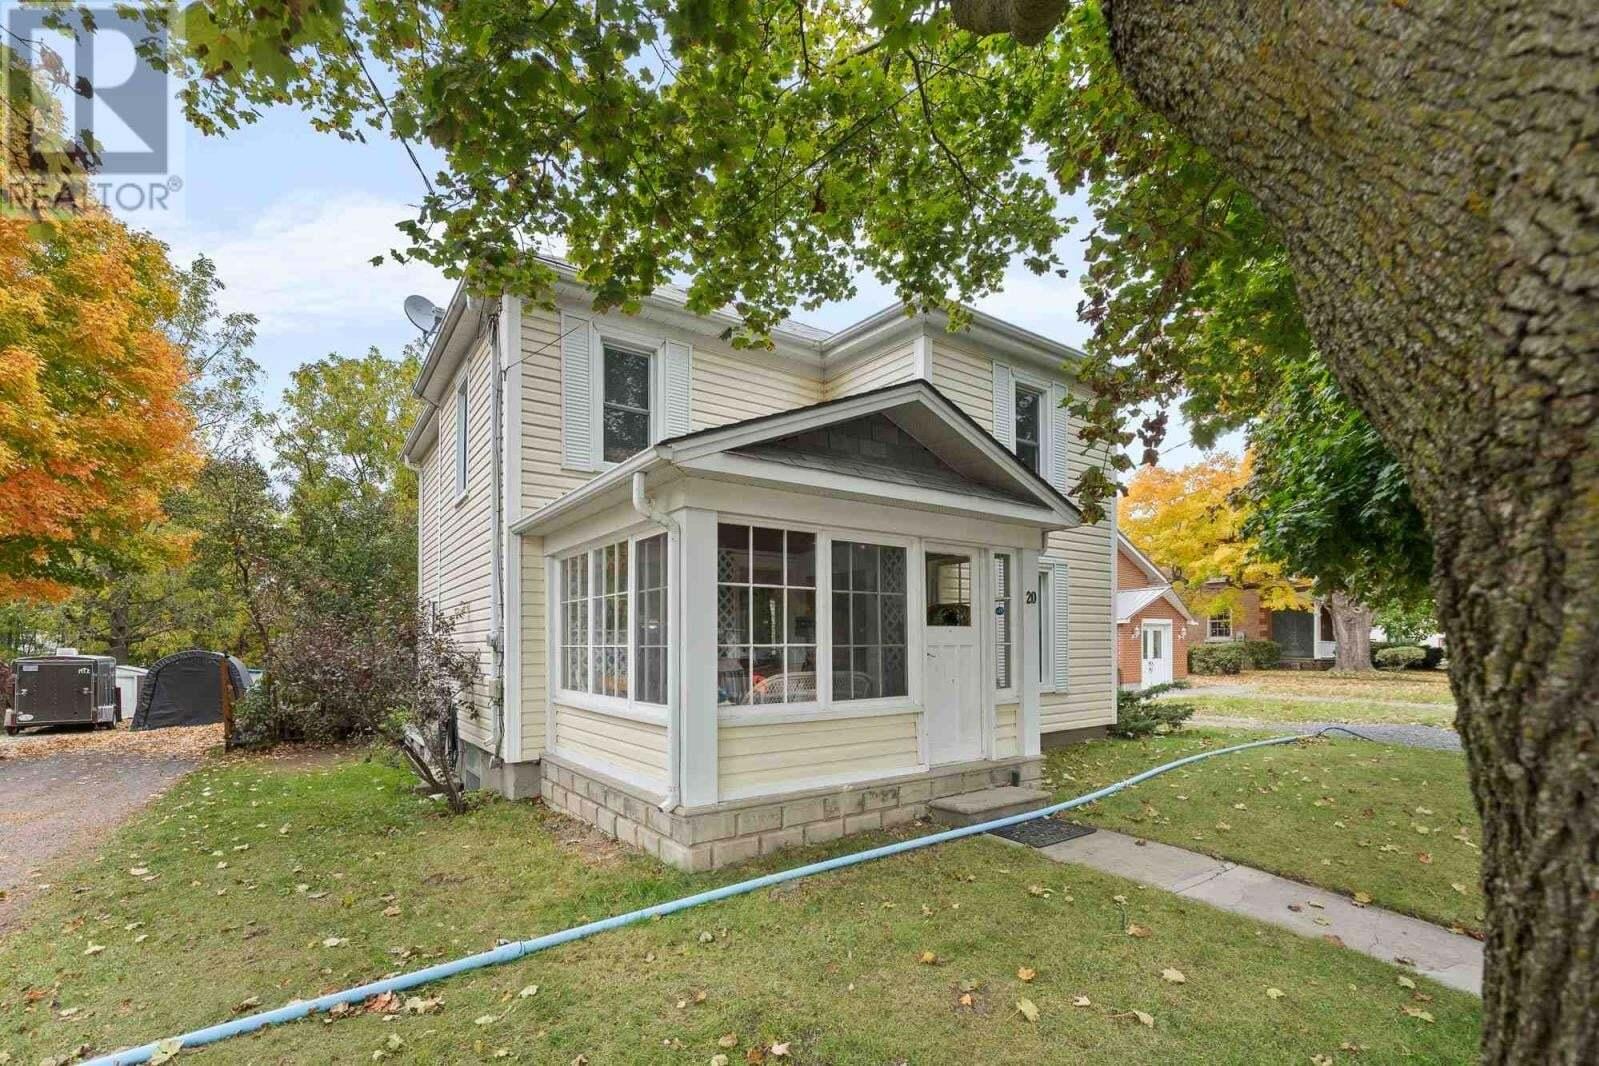 House for sale at 20 Talbot St Picton Ontario - MLS: K20005649